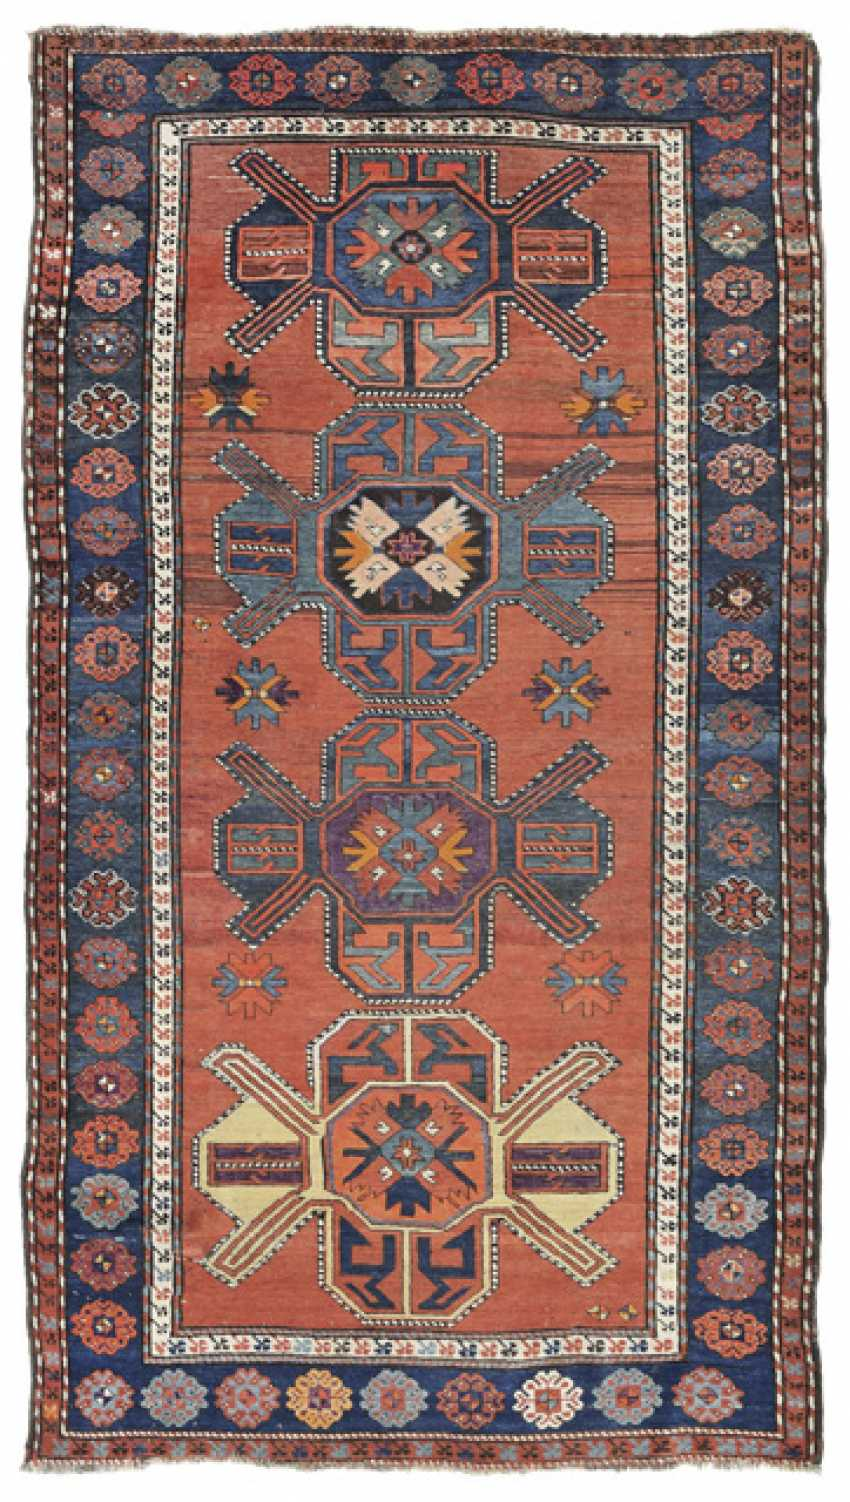 Tiermedaillon-Teppich. Karabagh-Gebiet, Kaukasus, um 1910 - Foto 1